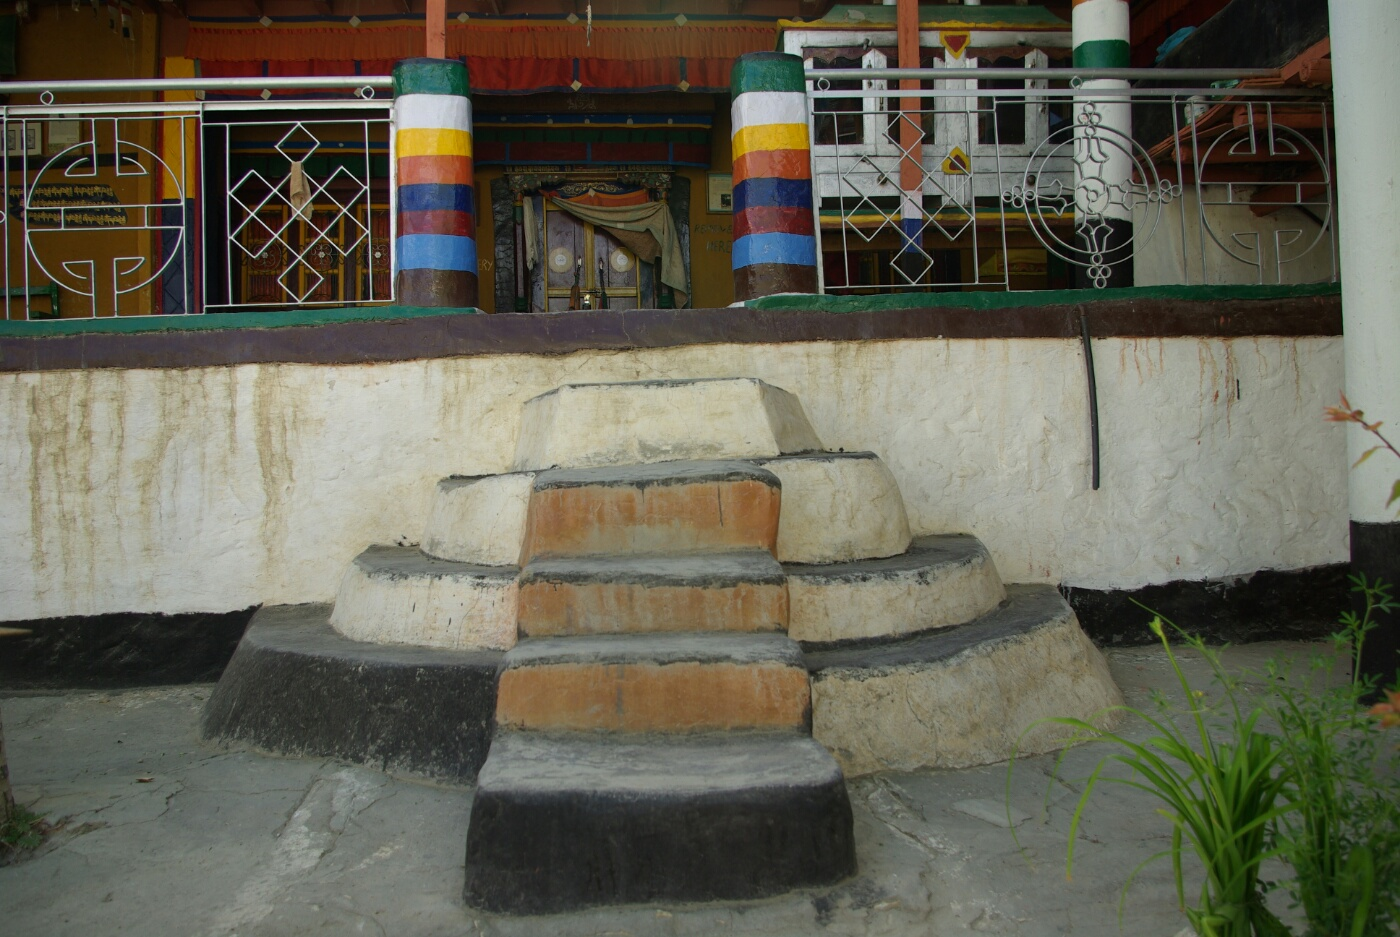 Wakha Kloster: Treppenaufgang zum Gebetsraum.